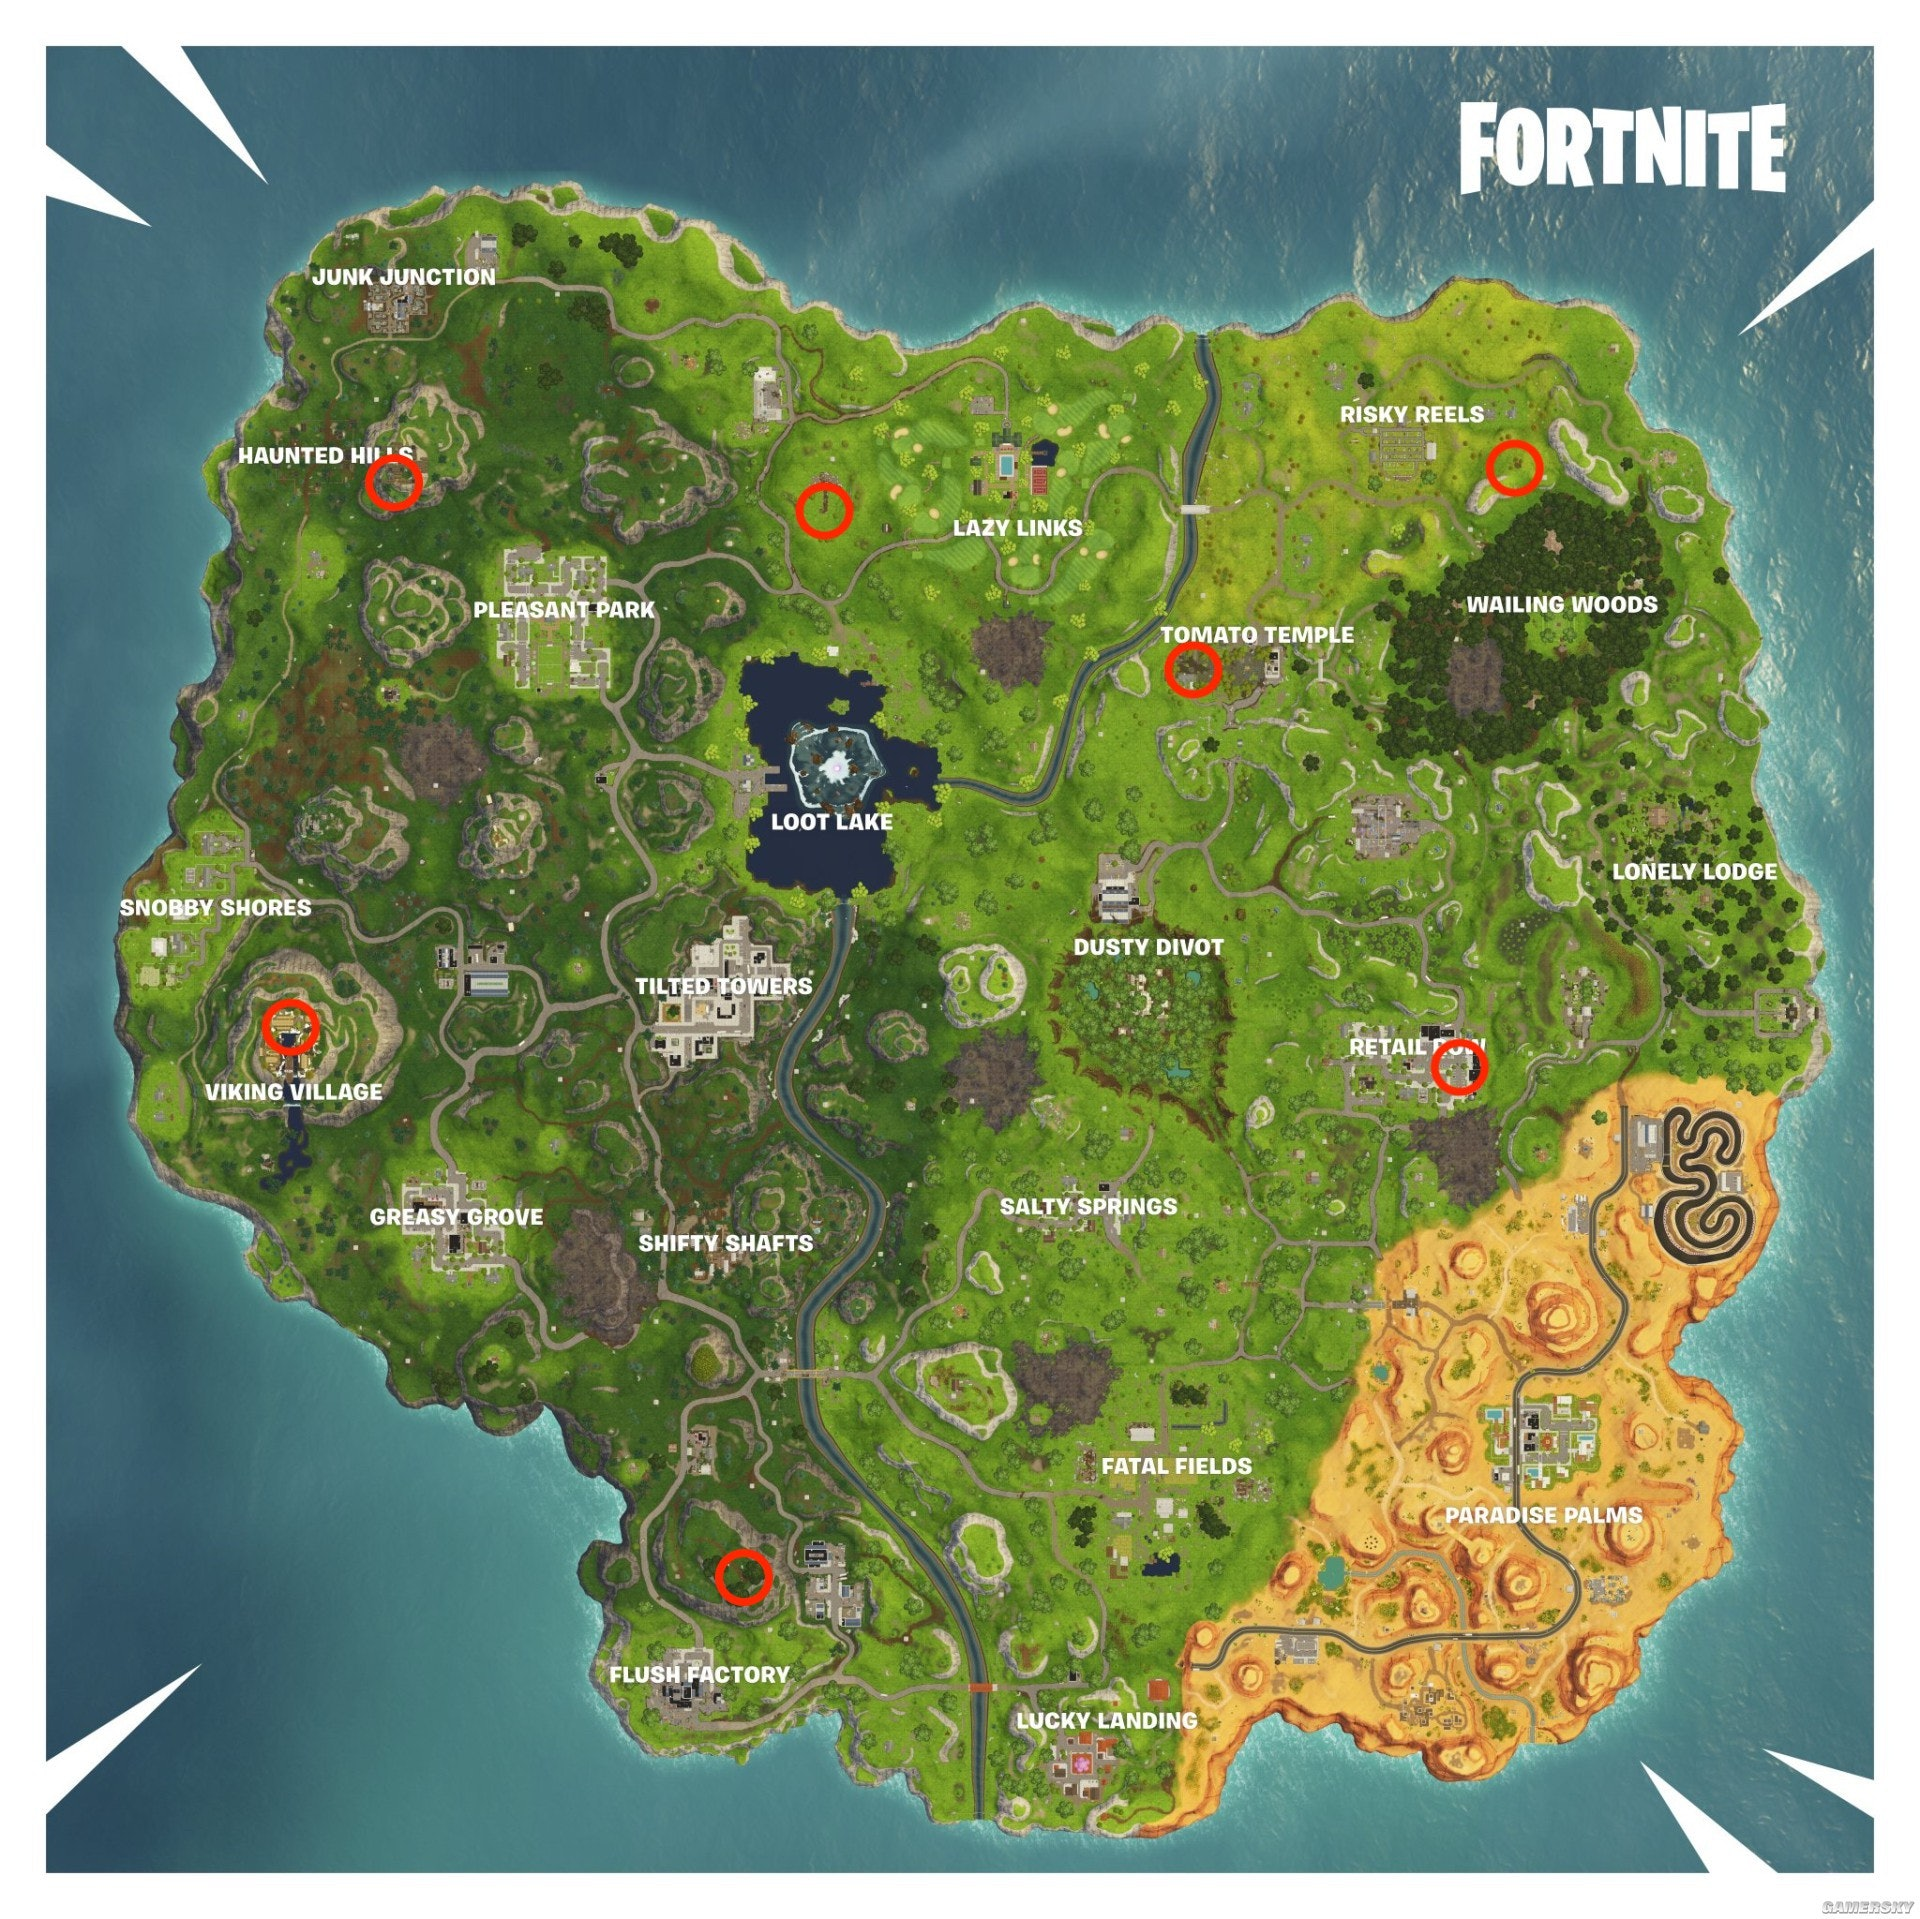 'Fortnite' Fortnitemares Gargoyle Locations Map